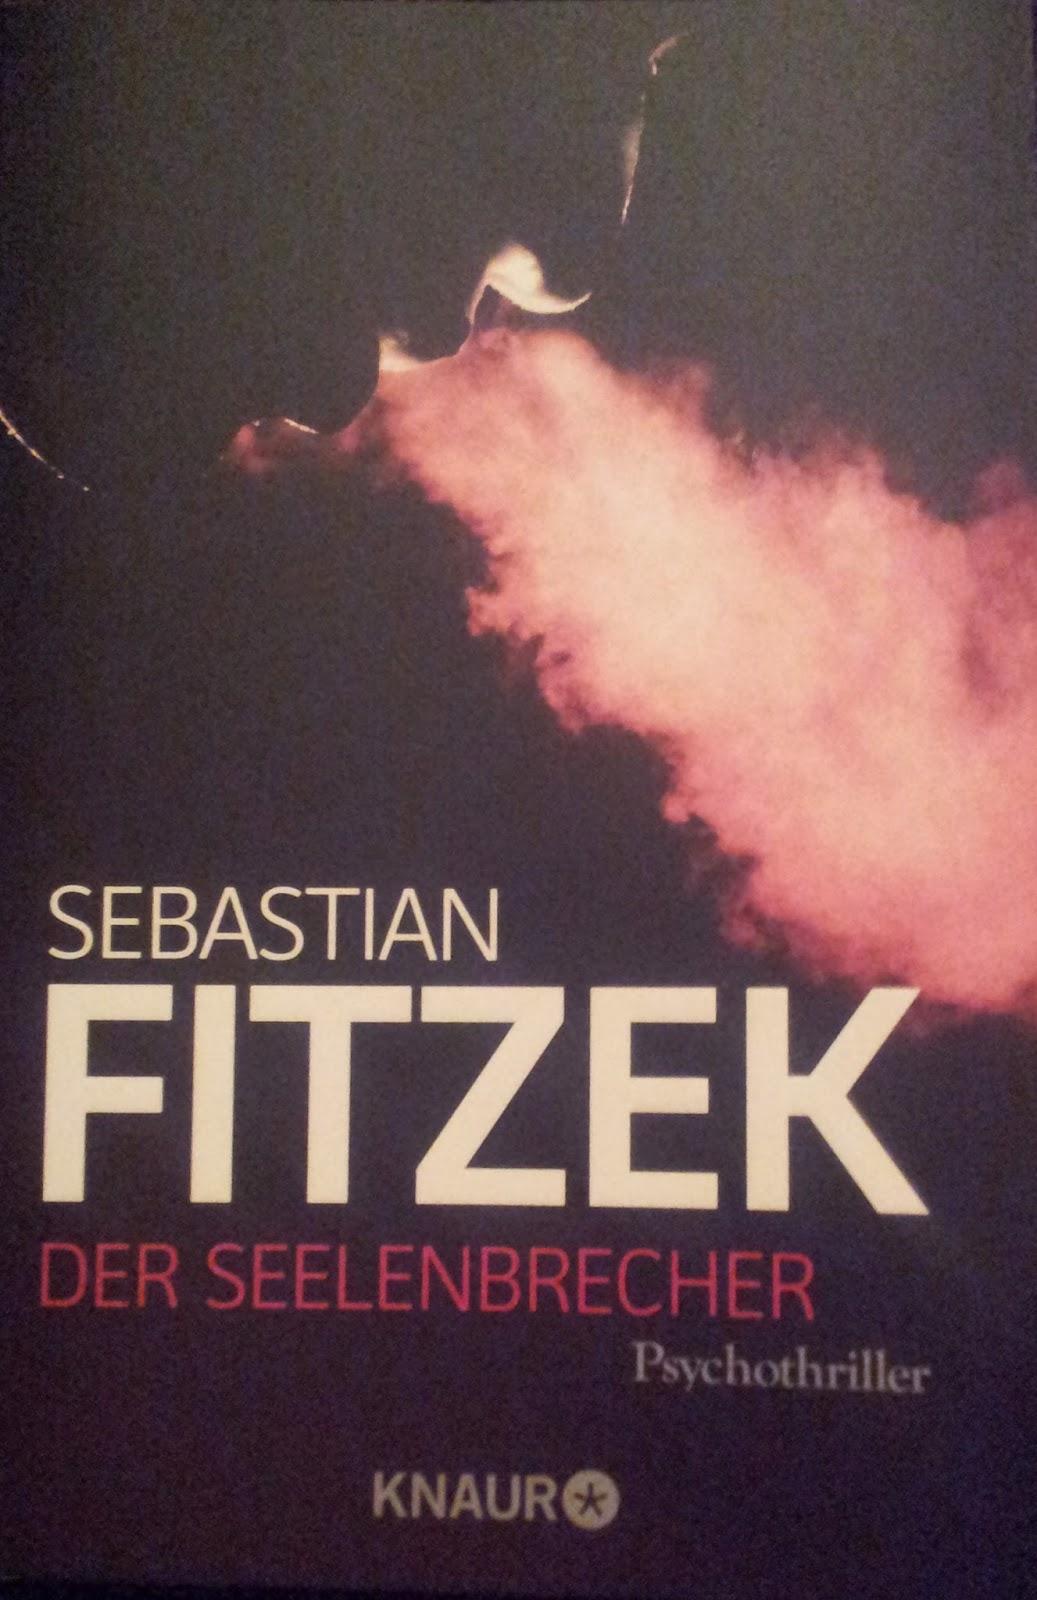 [Buch] Der Seelenbrecher von Sebastian Fitzek